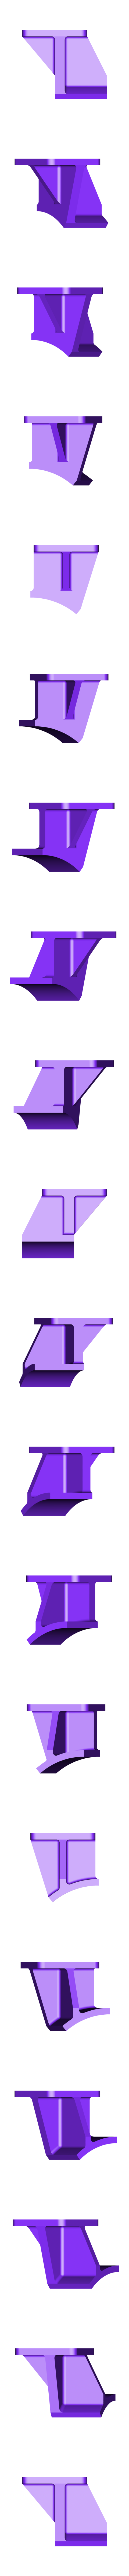 Front_Step_Bracket_Seat_Right.STL Download free STL file 4-8-8-4 Big Boy Locomotive • 3D printer object, RaymondDeLuca